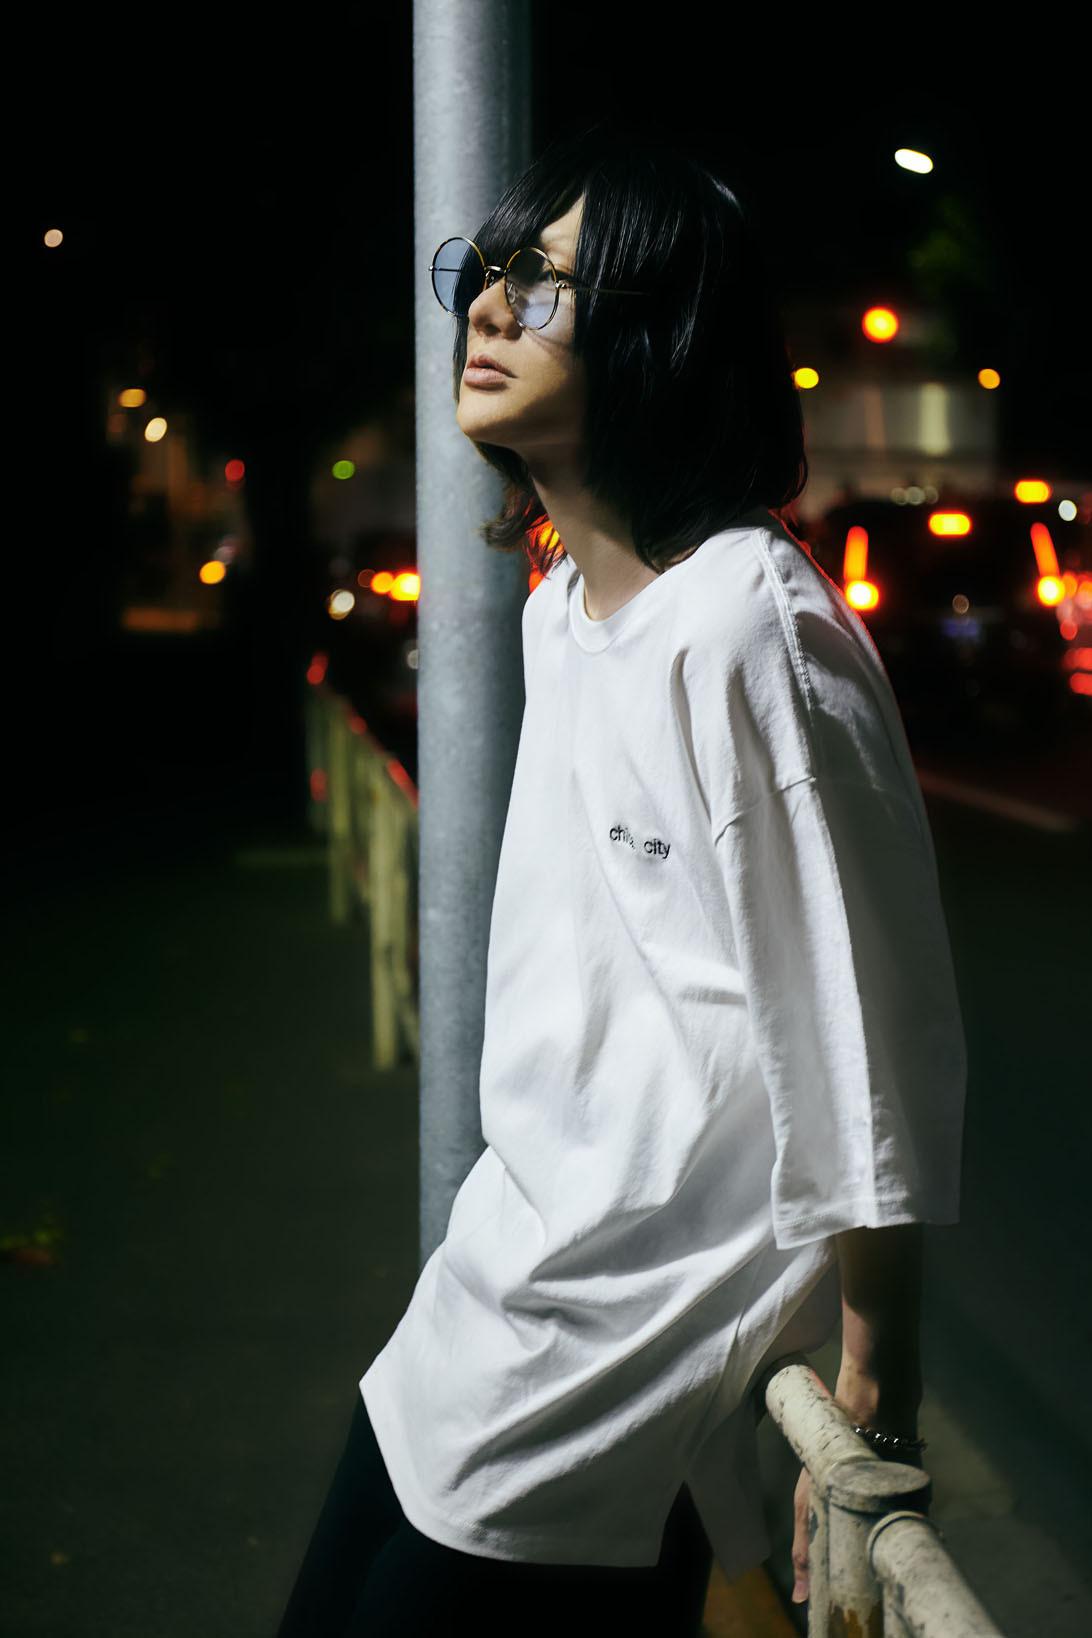 """chiba city, wakabaku, pm6:30.""  big silhouette tee"